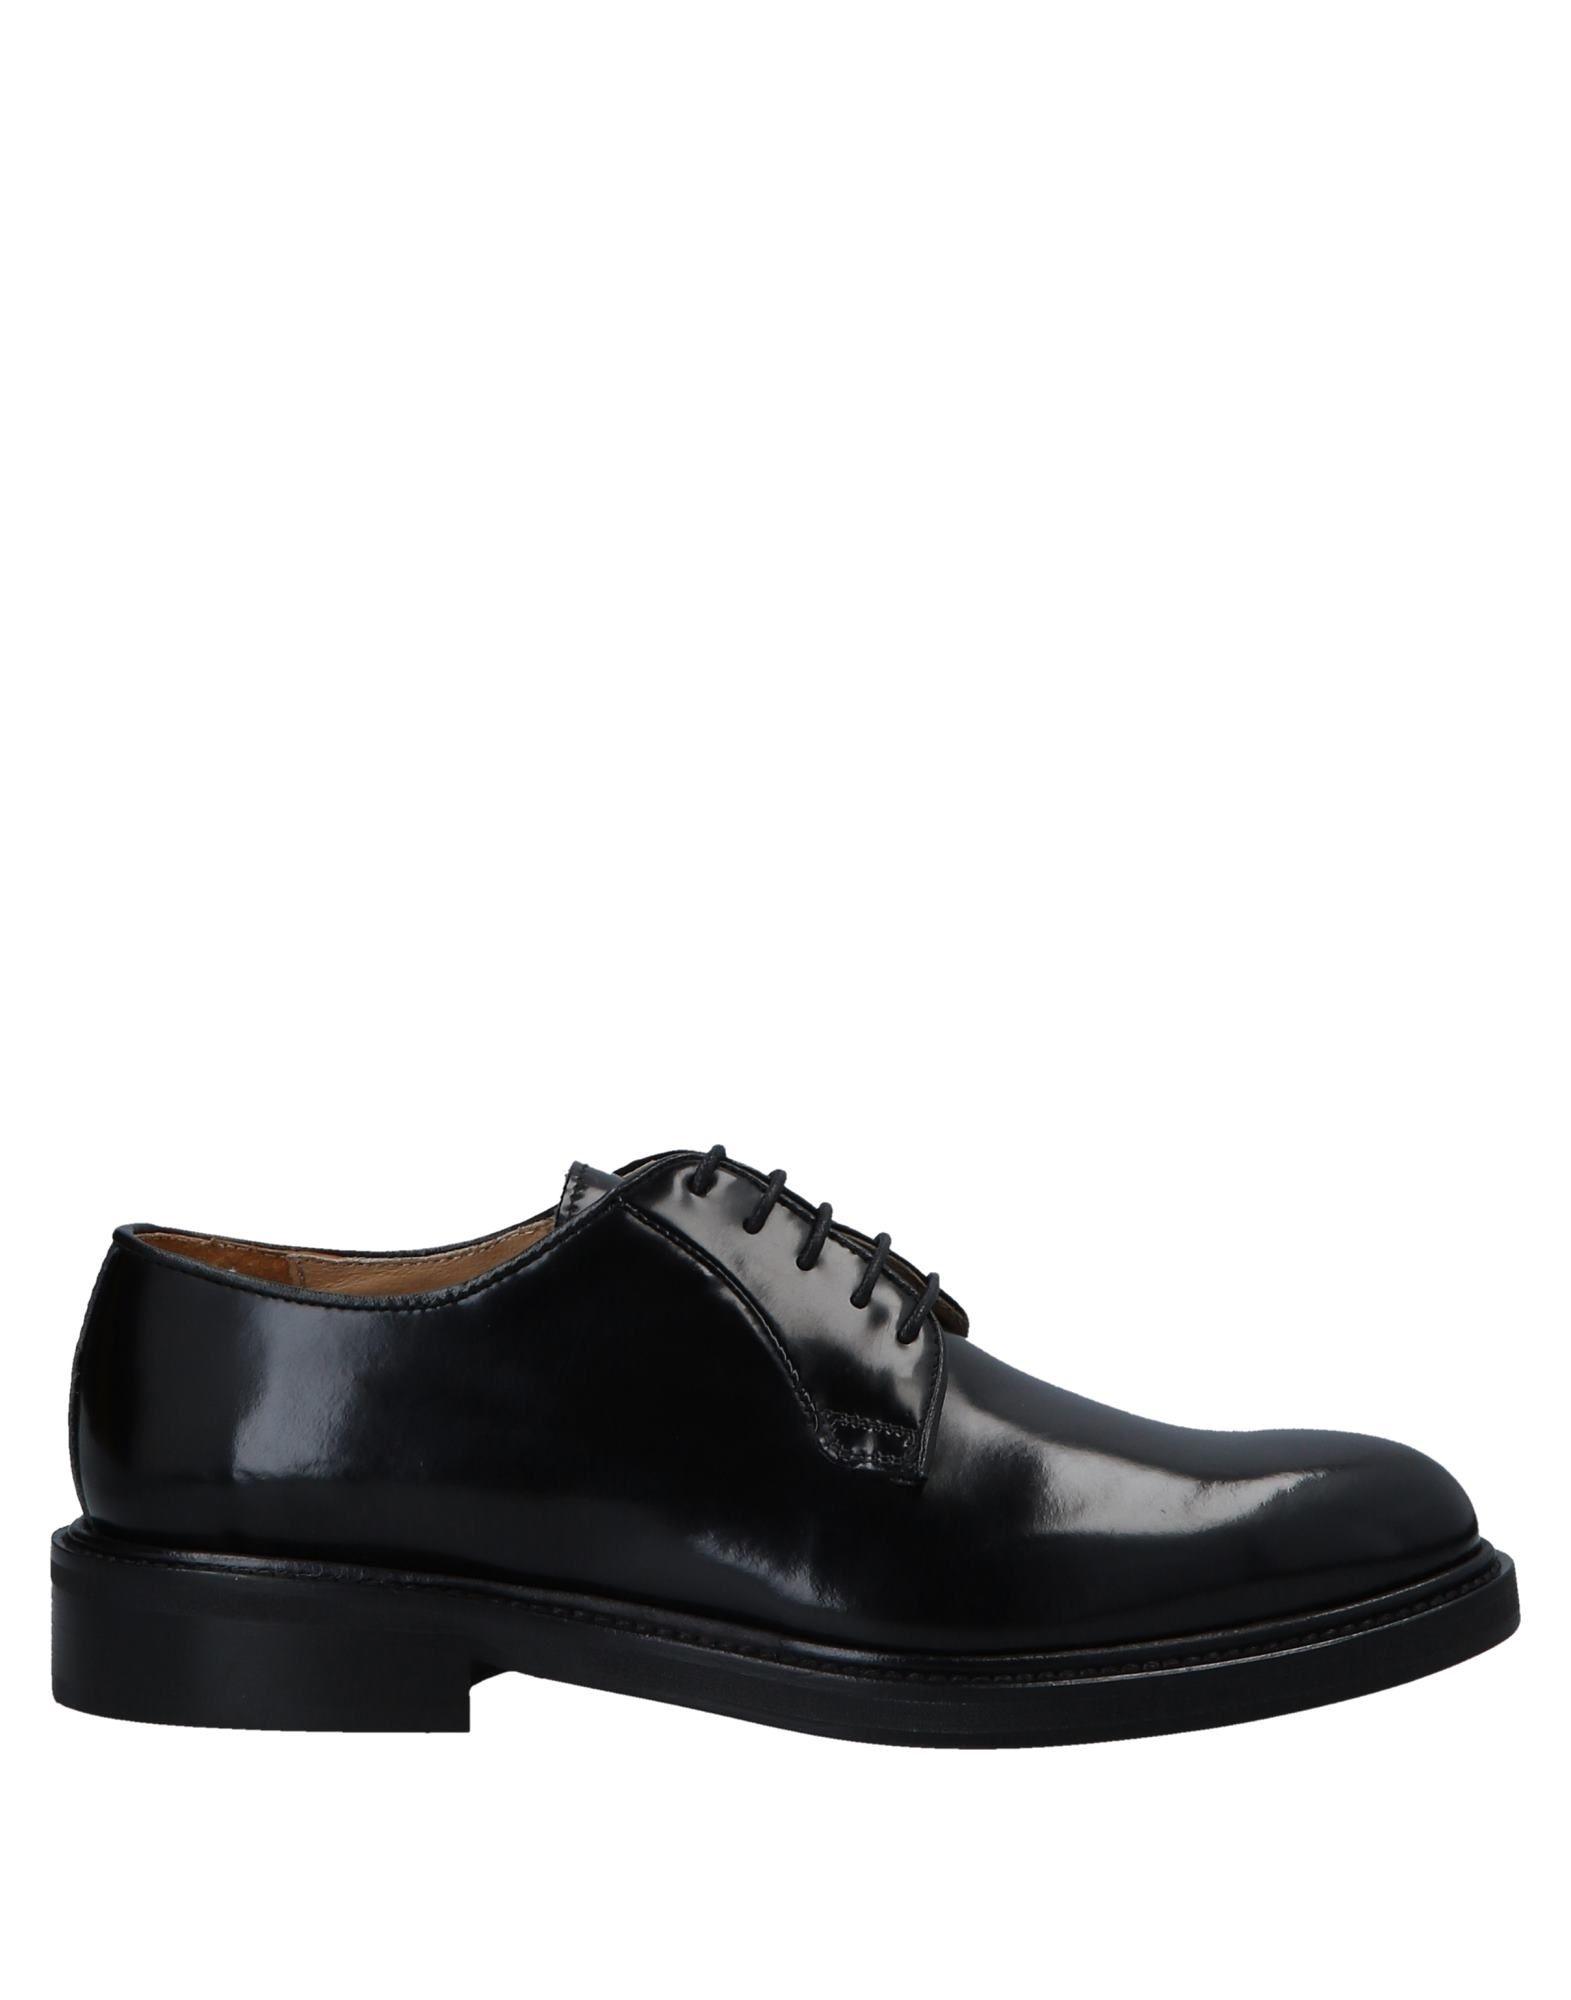 Rabatt echte Schuhe Domenico Tagliente Schnürschuhe Herren  11553196LC